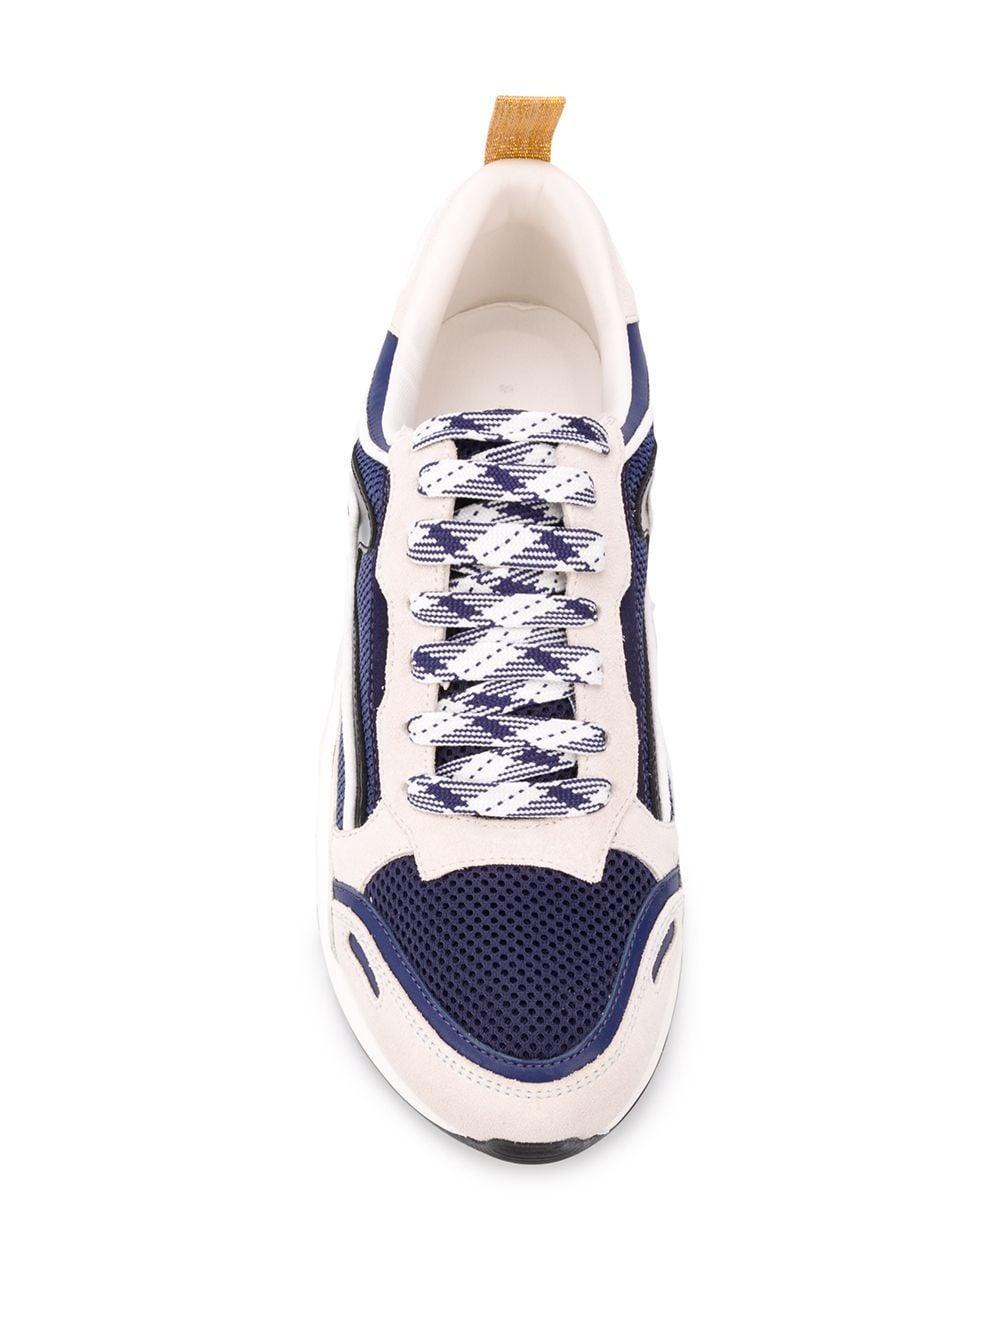 Baskets Flame Cuir Sandro en coloris Bleu yQ0N